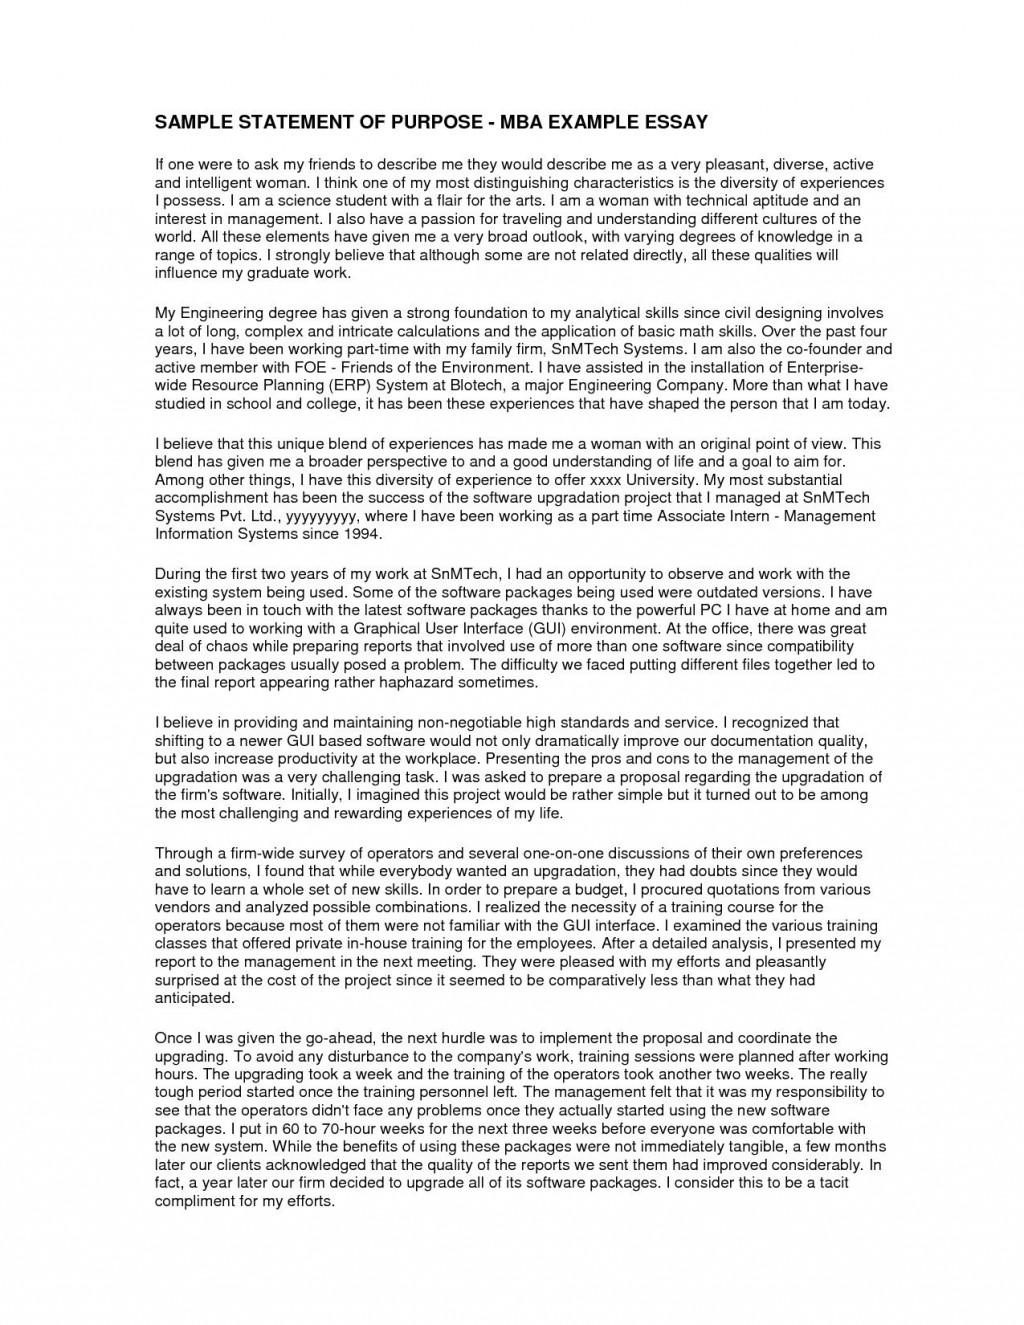 002 Statement Of Purpose Sample Essays Essay Example Fearsome Nursing Graduate School Education Mba Large